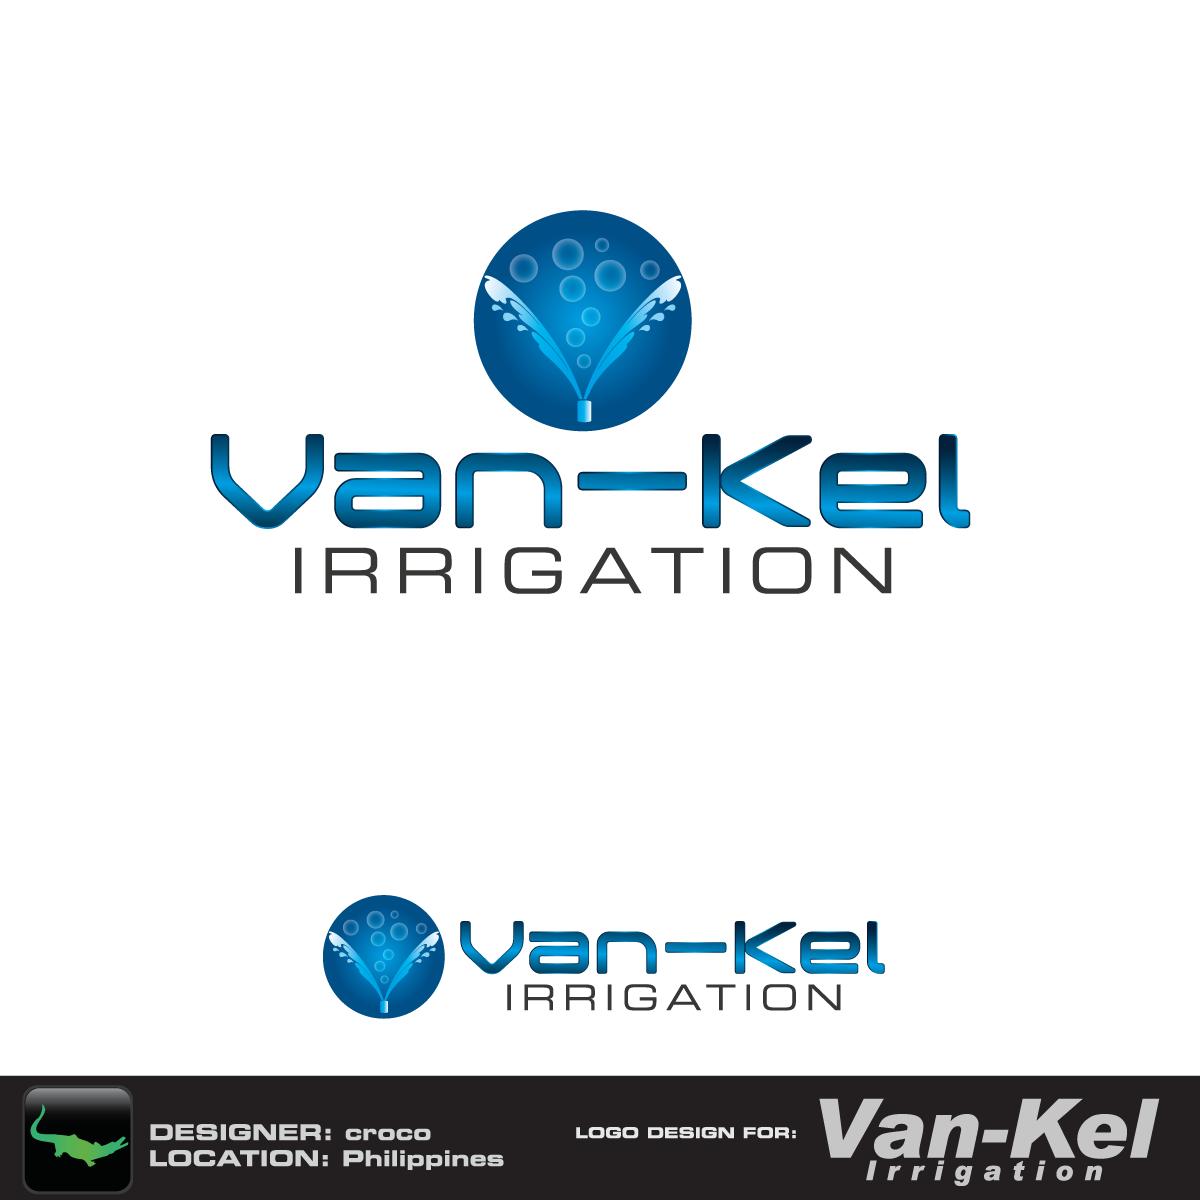 Logo Design by rockin - Entry No. 63 in the Logo Design Contest Van-Kel Irrigation Logo Design.